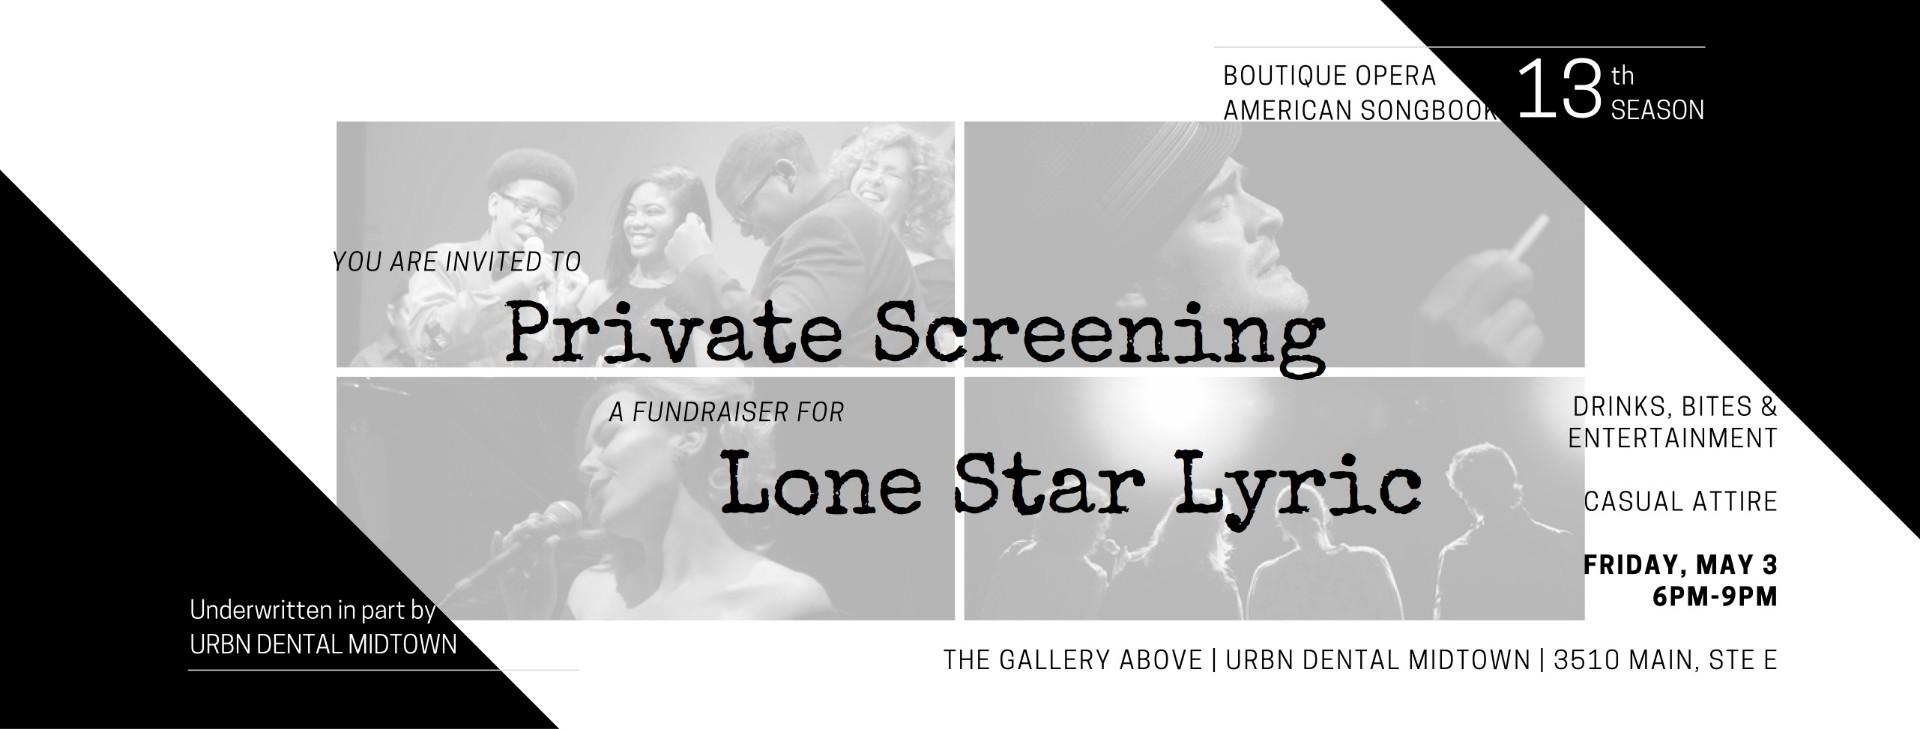 Private Screening - Title Block